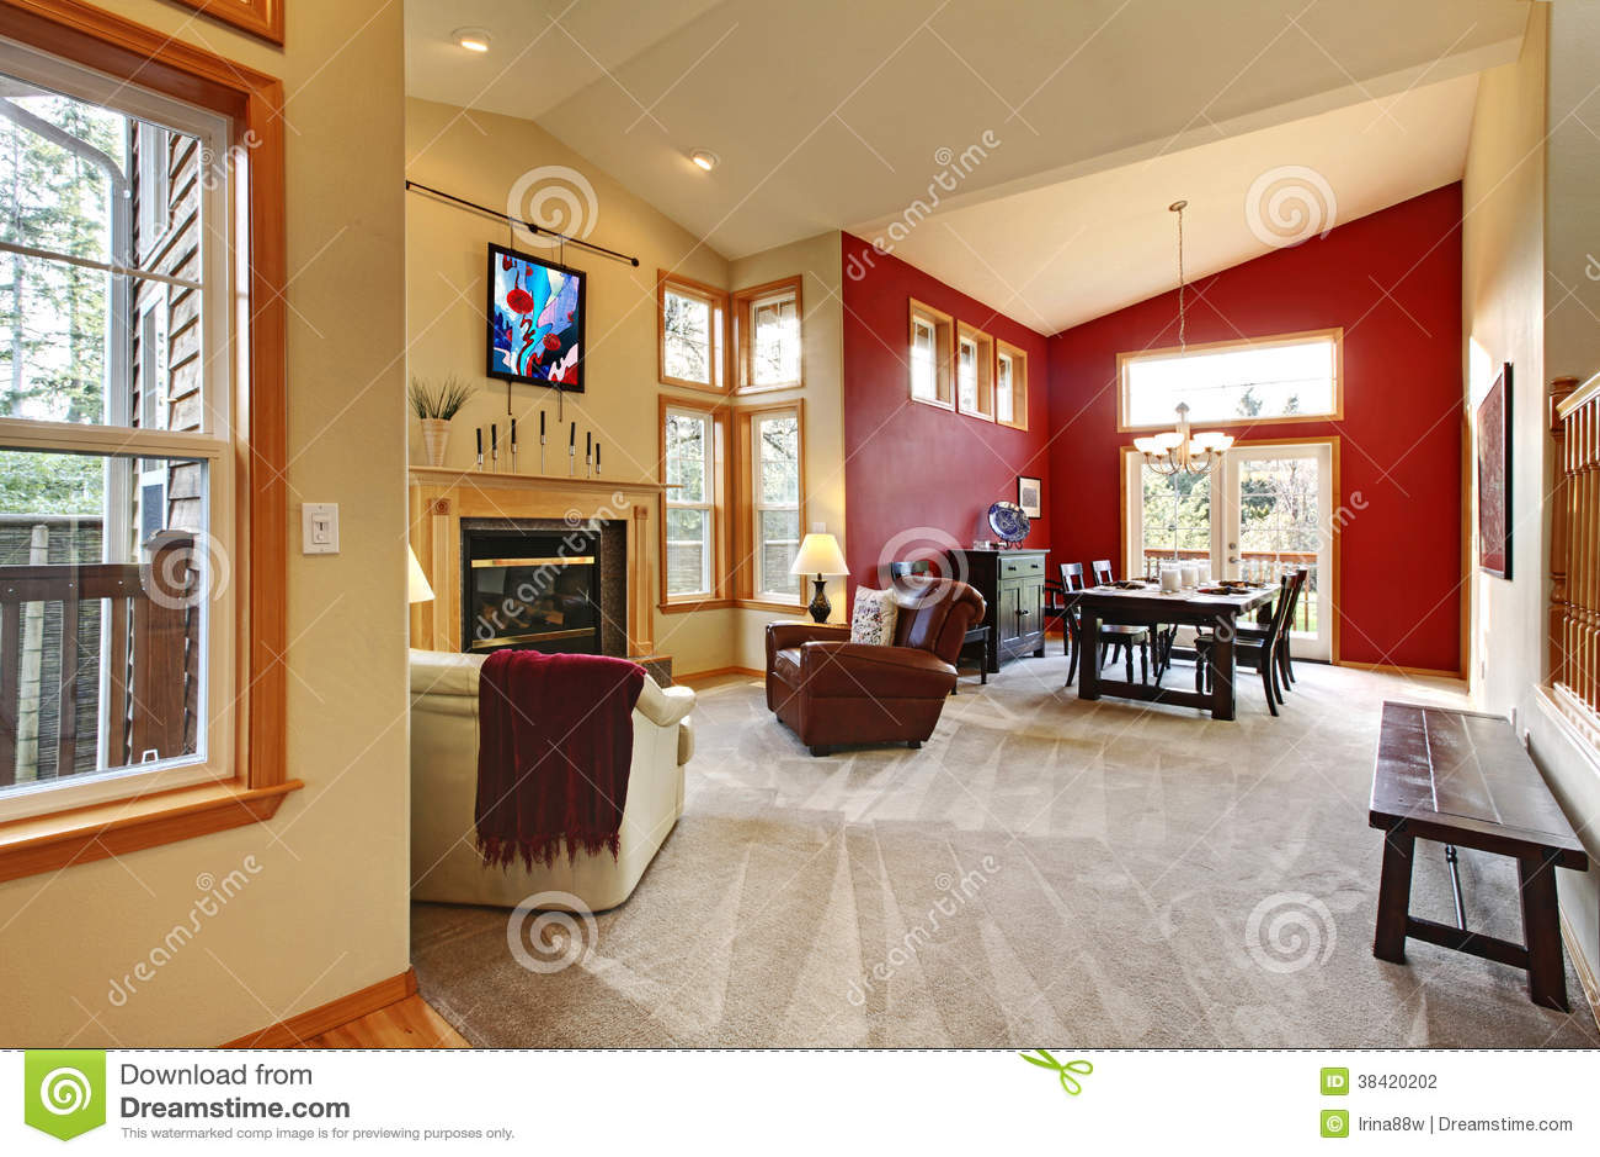 Moderne Grote Open Woonkamer Met Rode Muur. Stock Fotografie - Beeld ...